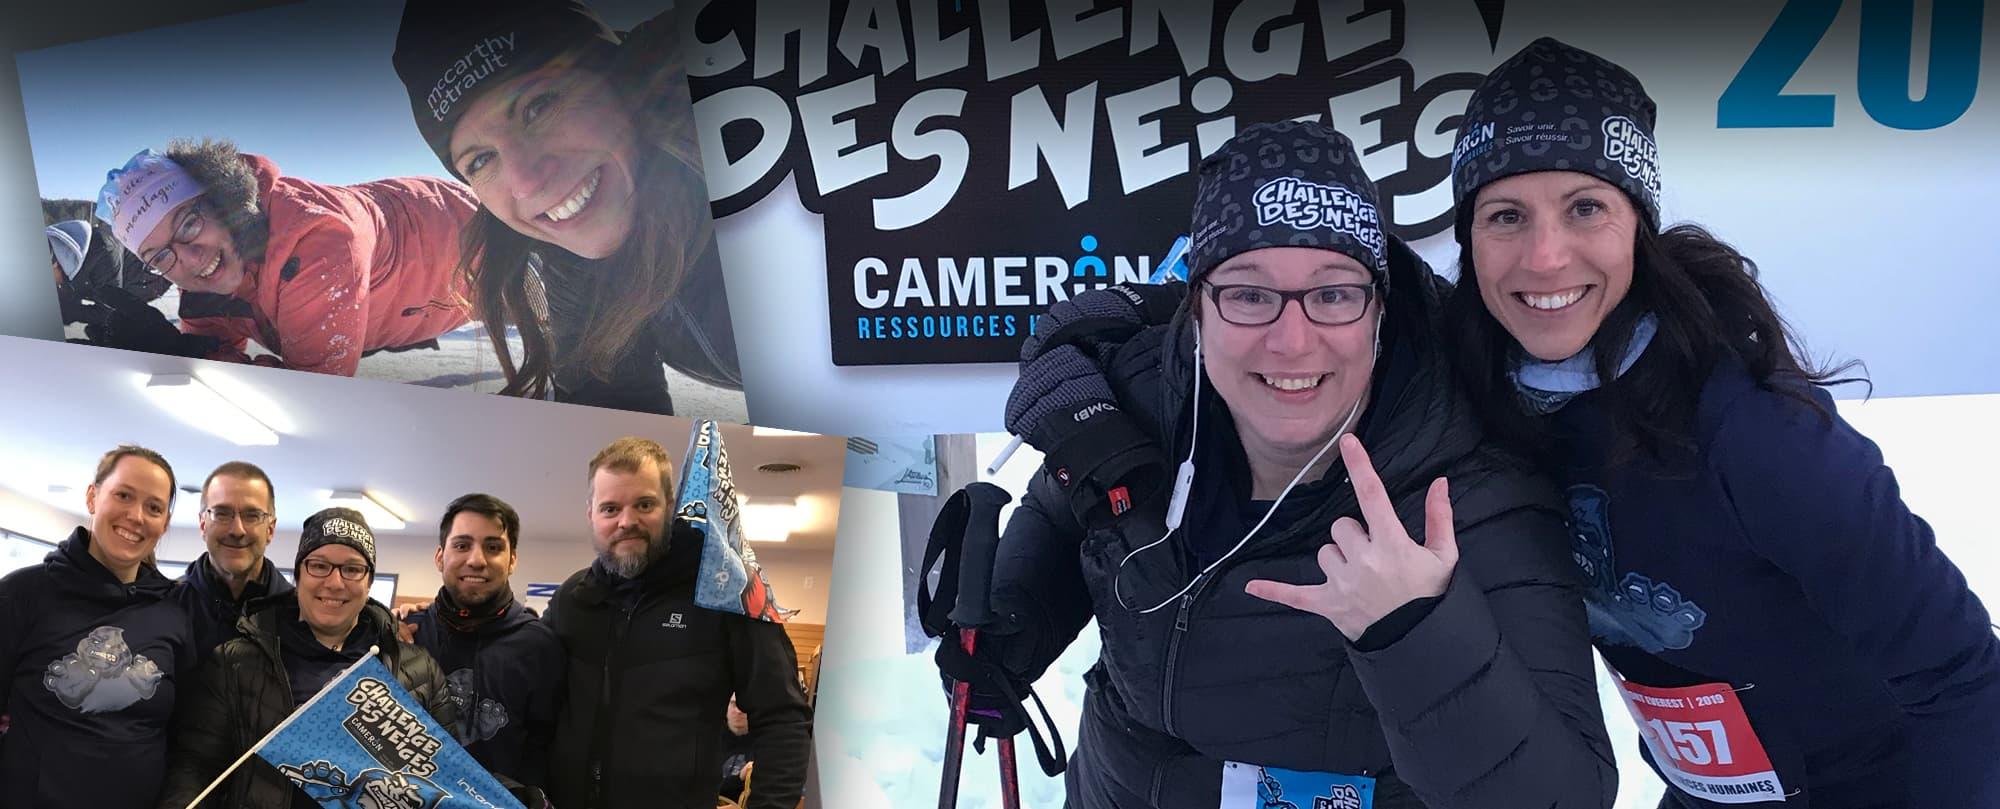 Cameron ressources humaines Challenge des neiges